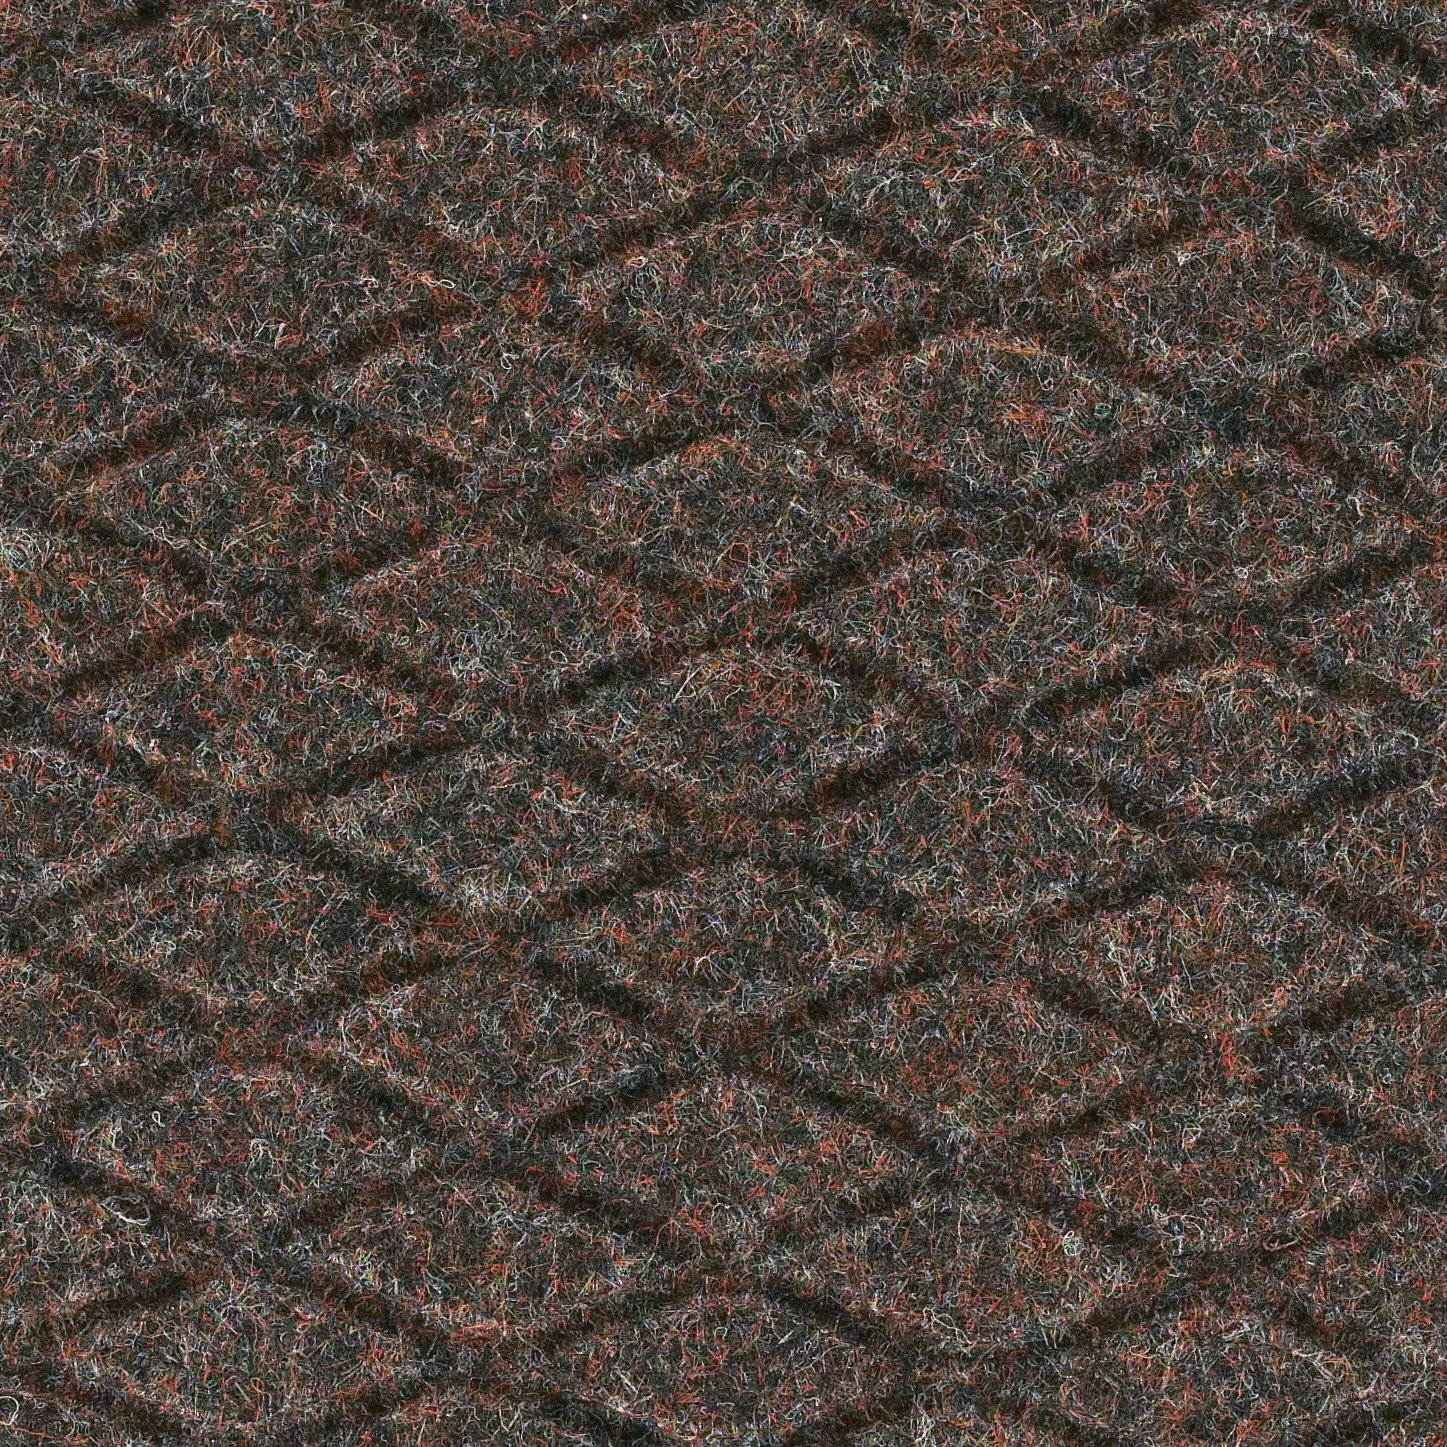 Andersen 442 Hog Heaven Fashion Nitrile rubber Anti-Fatigue Floor Mat, Nitrile/PVC Rubber Cushion Backing, 12' Length x 3' Width, 7/8'' Thick, Cocoa Brown